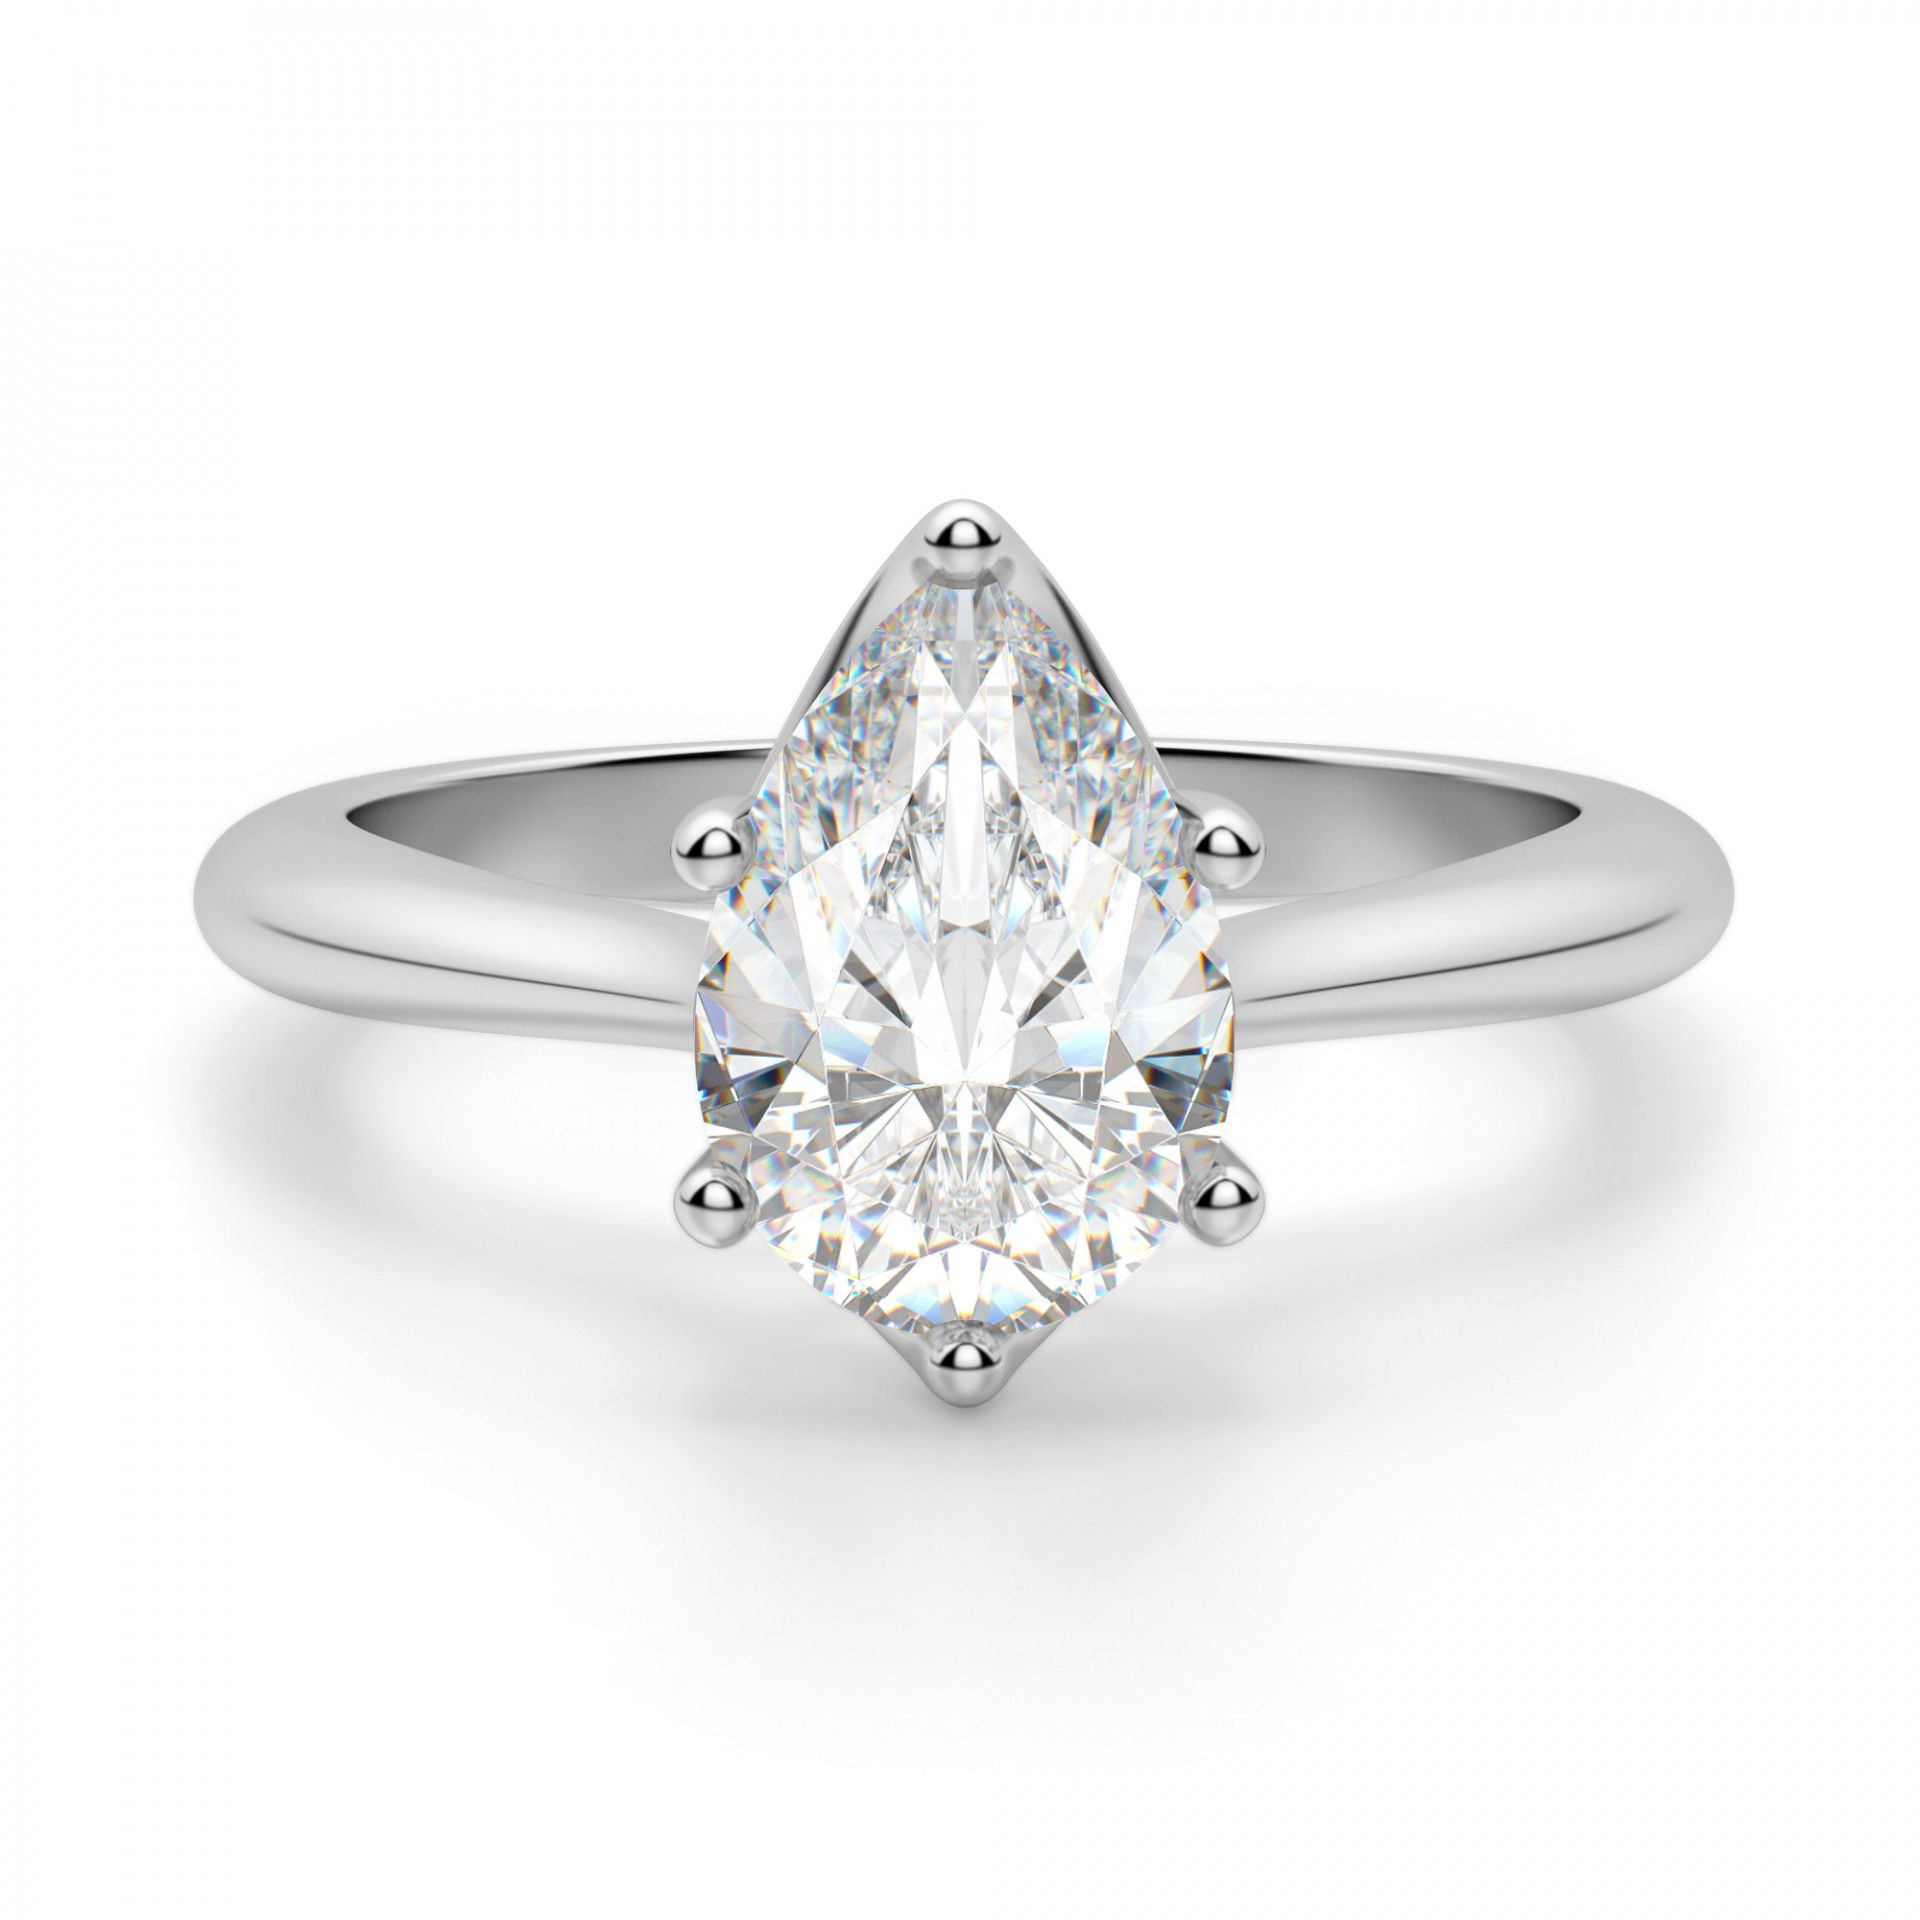 Diamond Nexus Bali Classic Pear Cut Engagement Ring